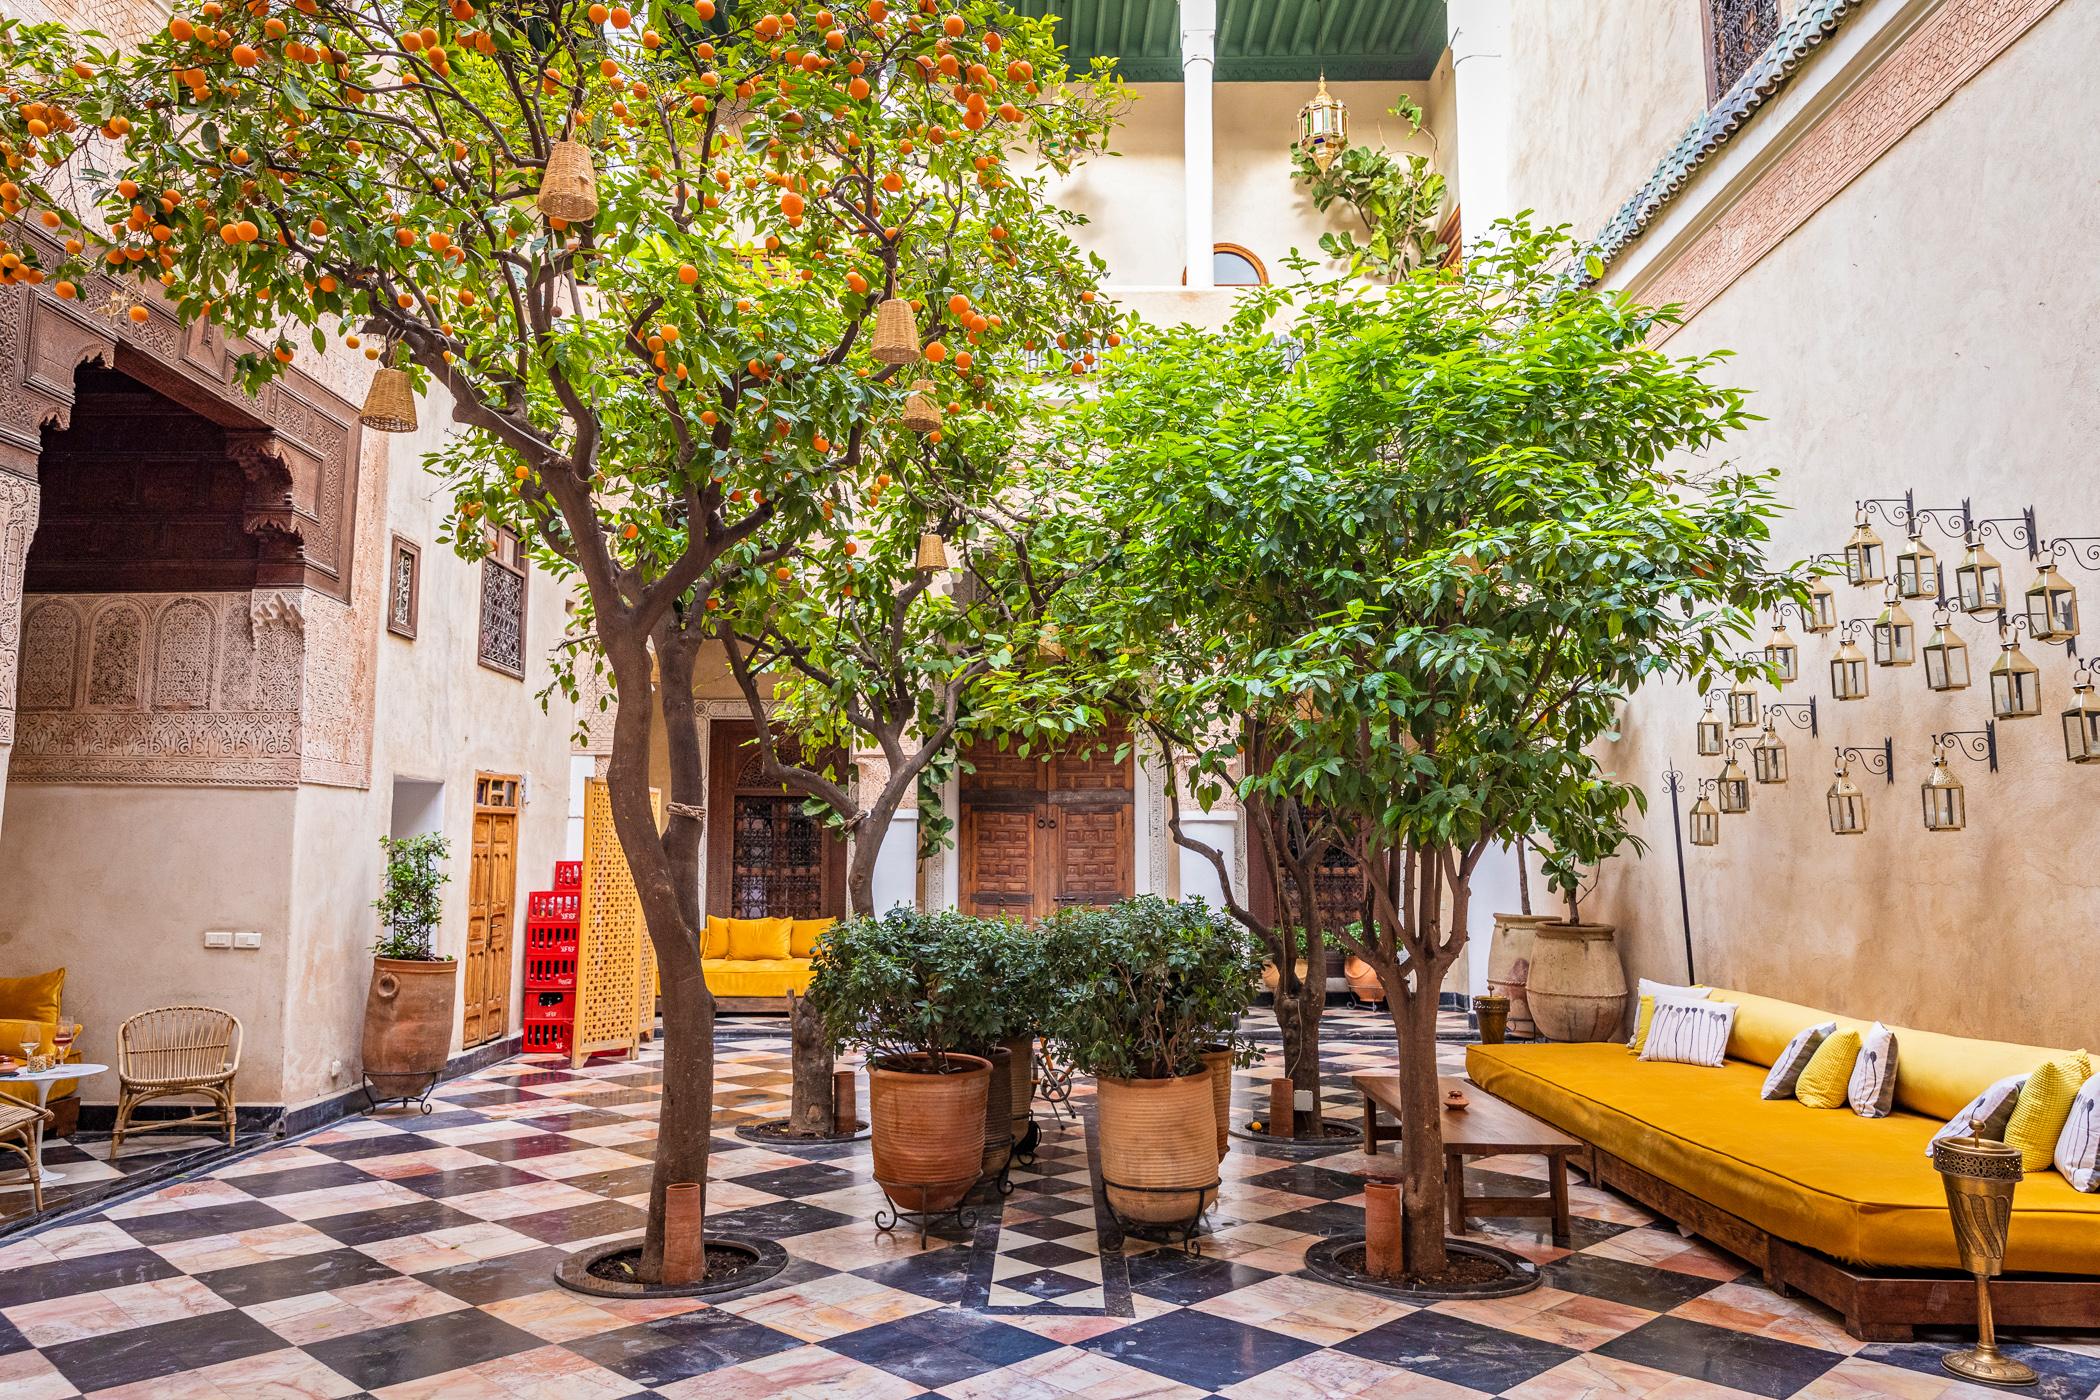 homtastics-Riad-El-Fenn-Marrakesch-Innenhof-1050x700@2x